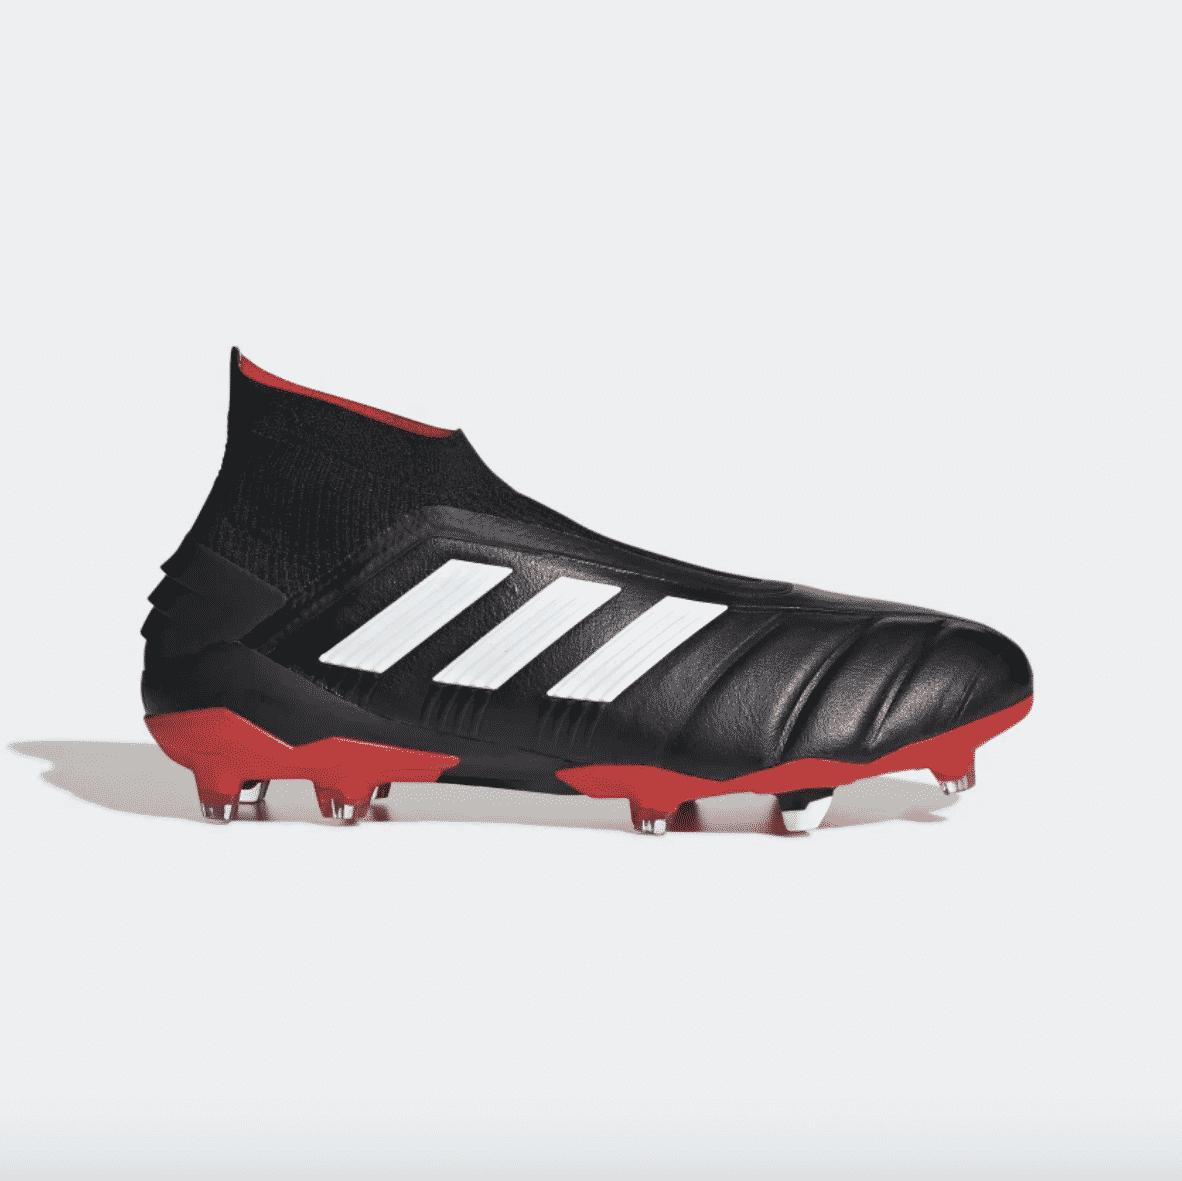 adidas-predator-19+-reedition-predator-mania-noir-1